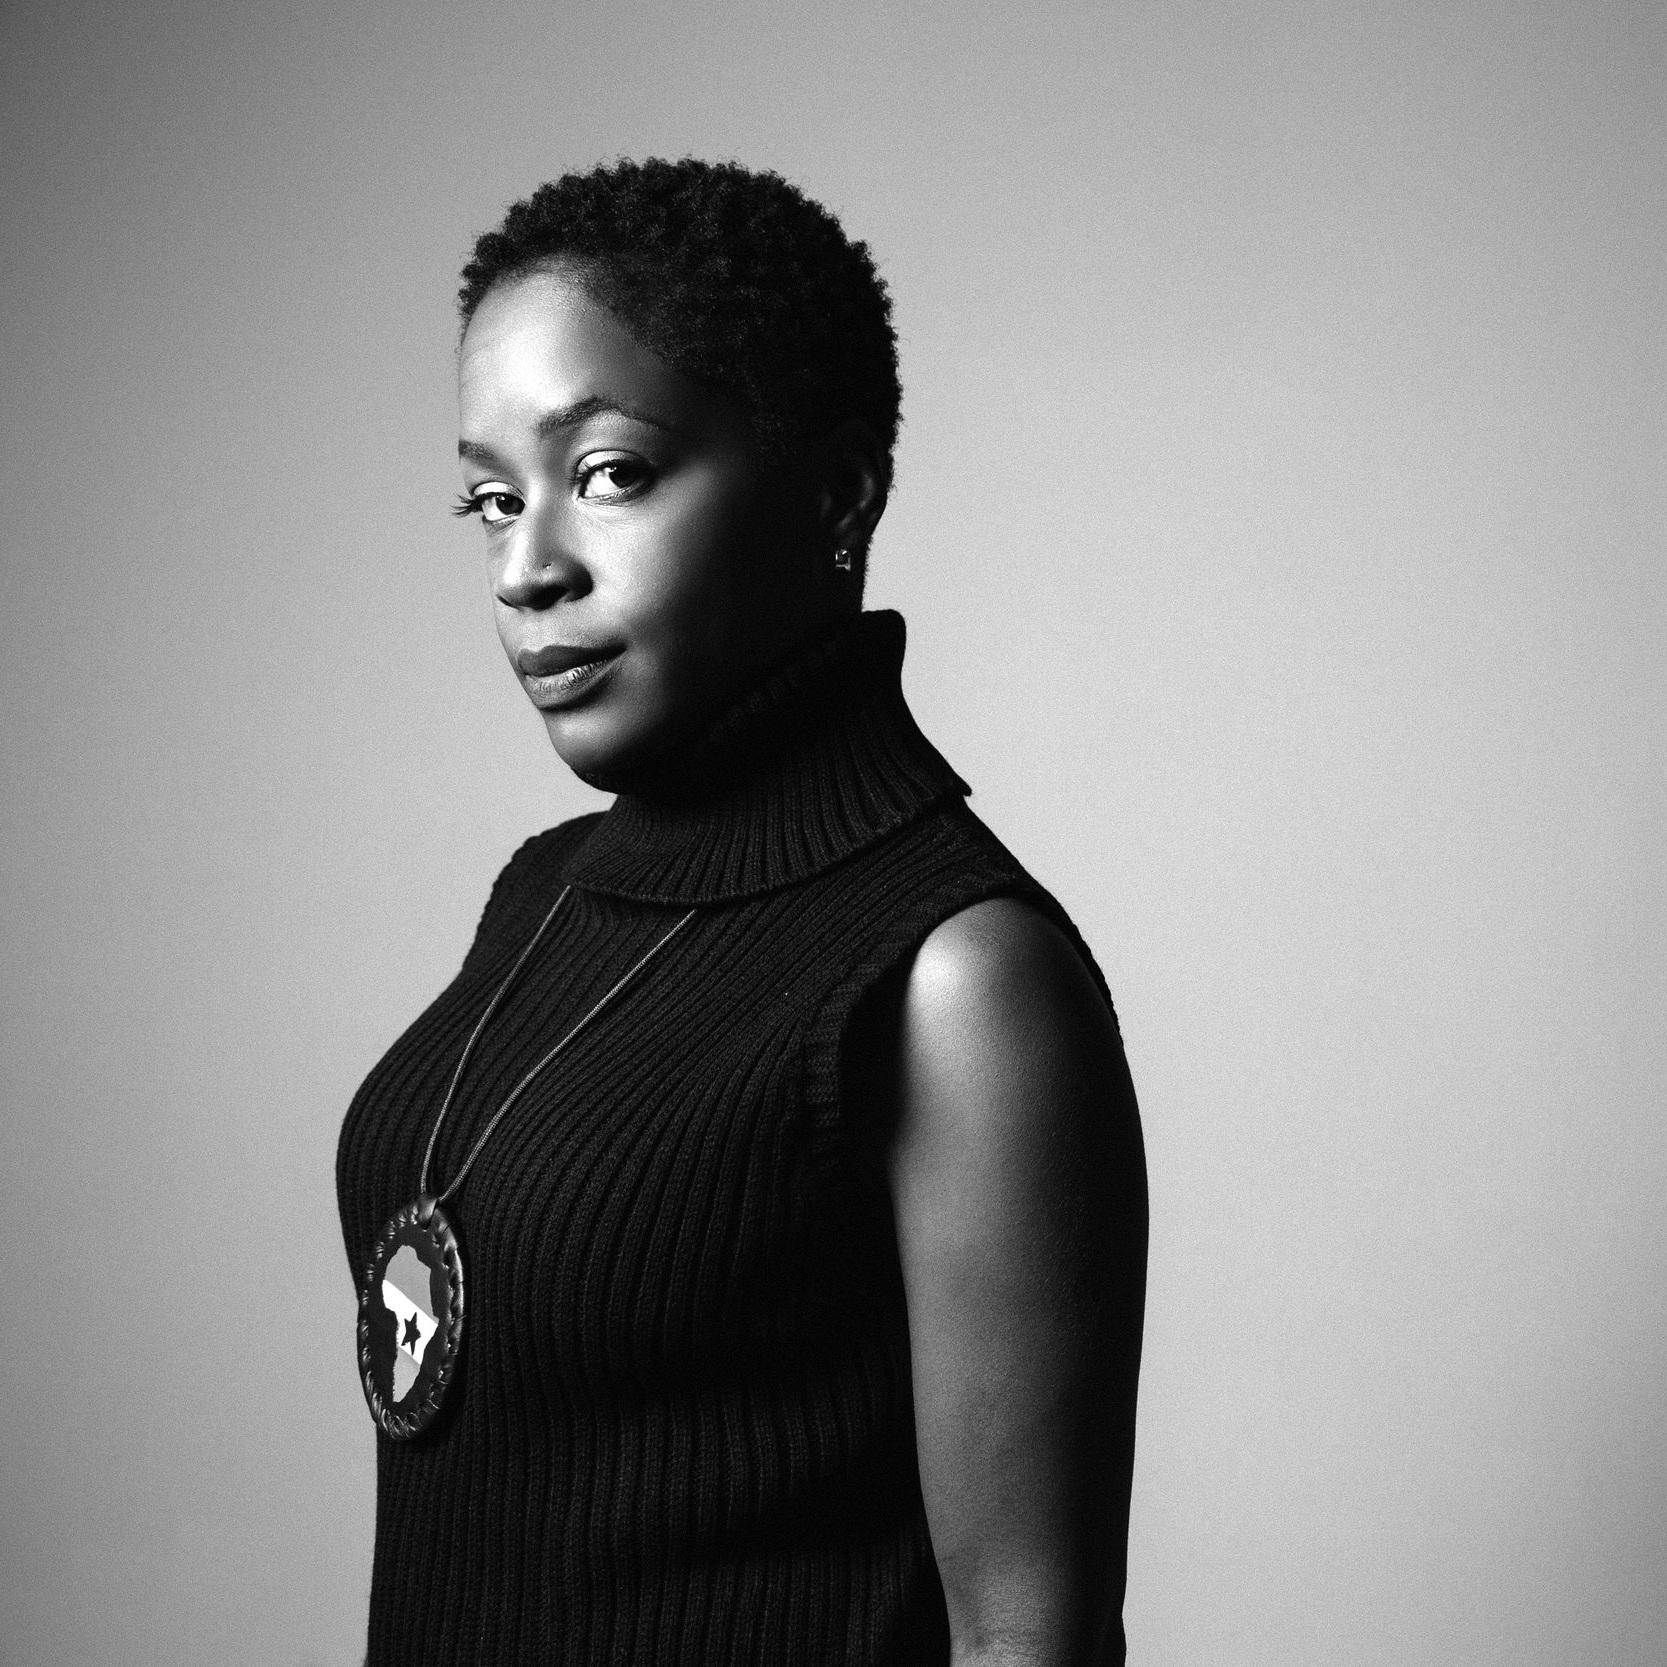 DR. YABA BLAY | Professional Black Girl